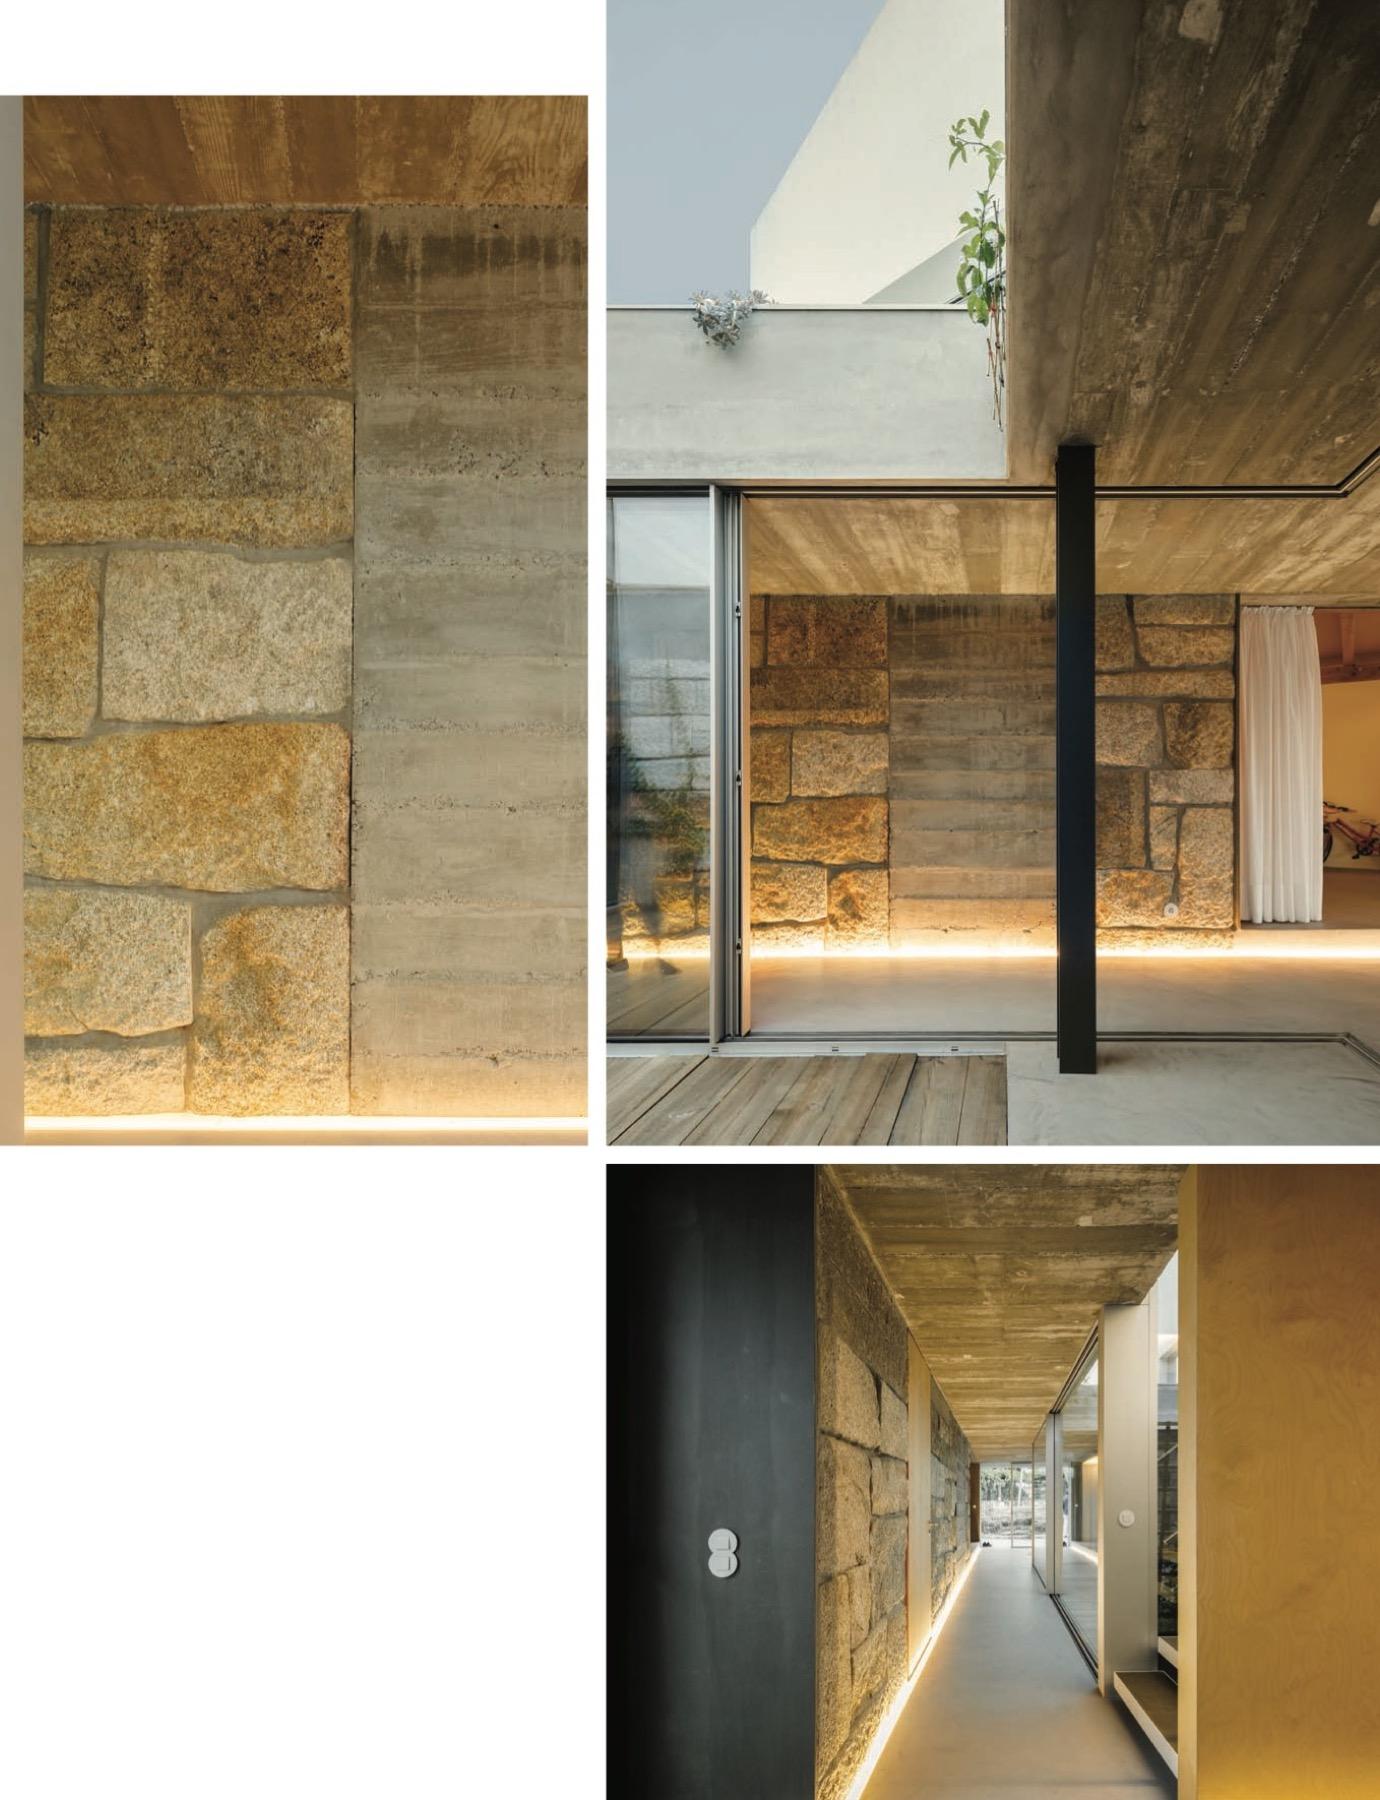 INTERIORS KOREA 414 casa rio paulo merlini ivo tavares studio 12 13